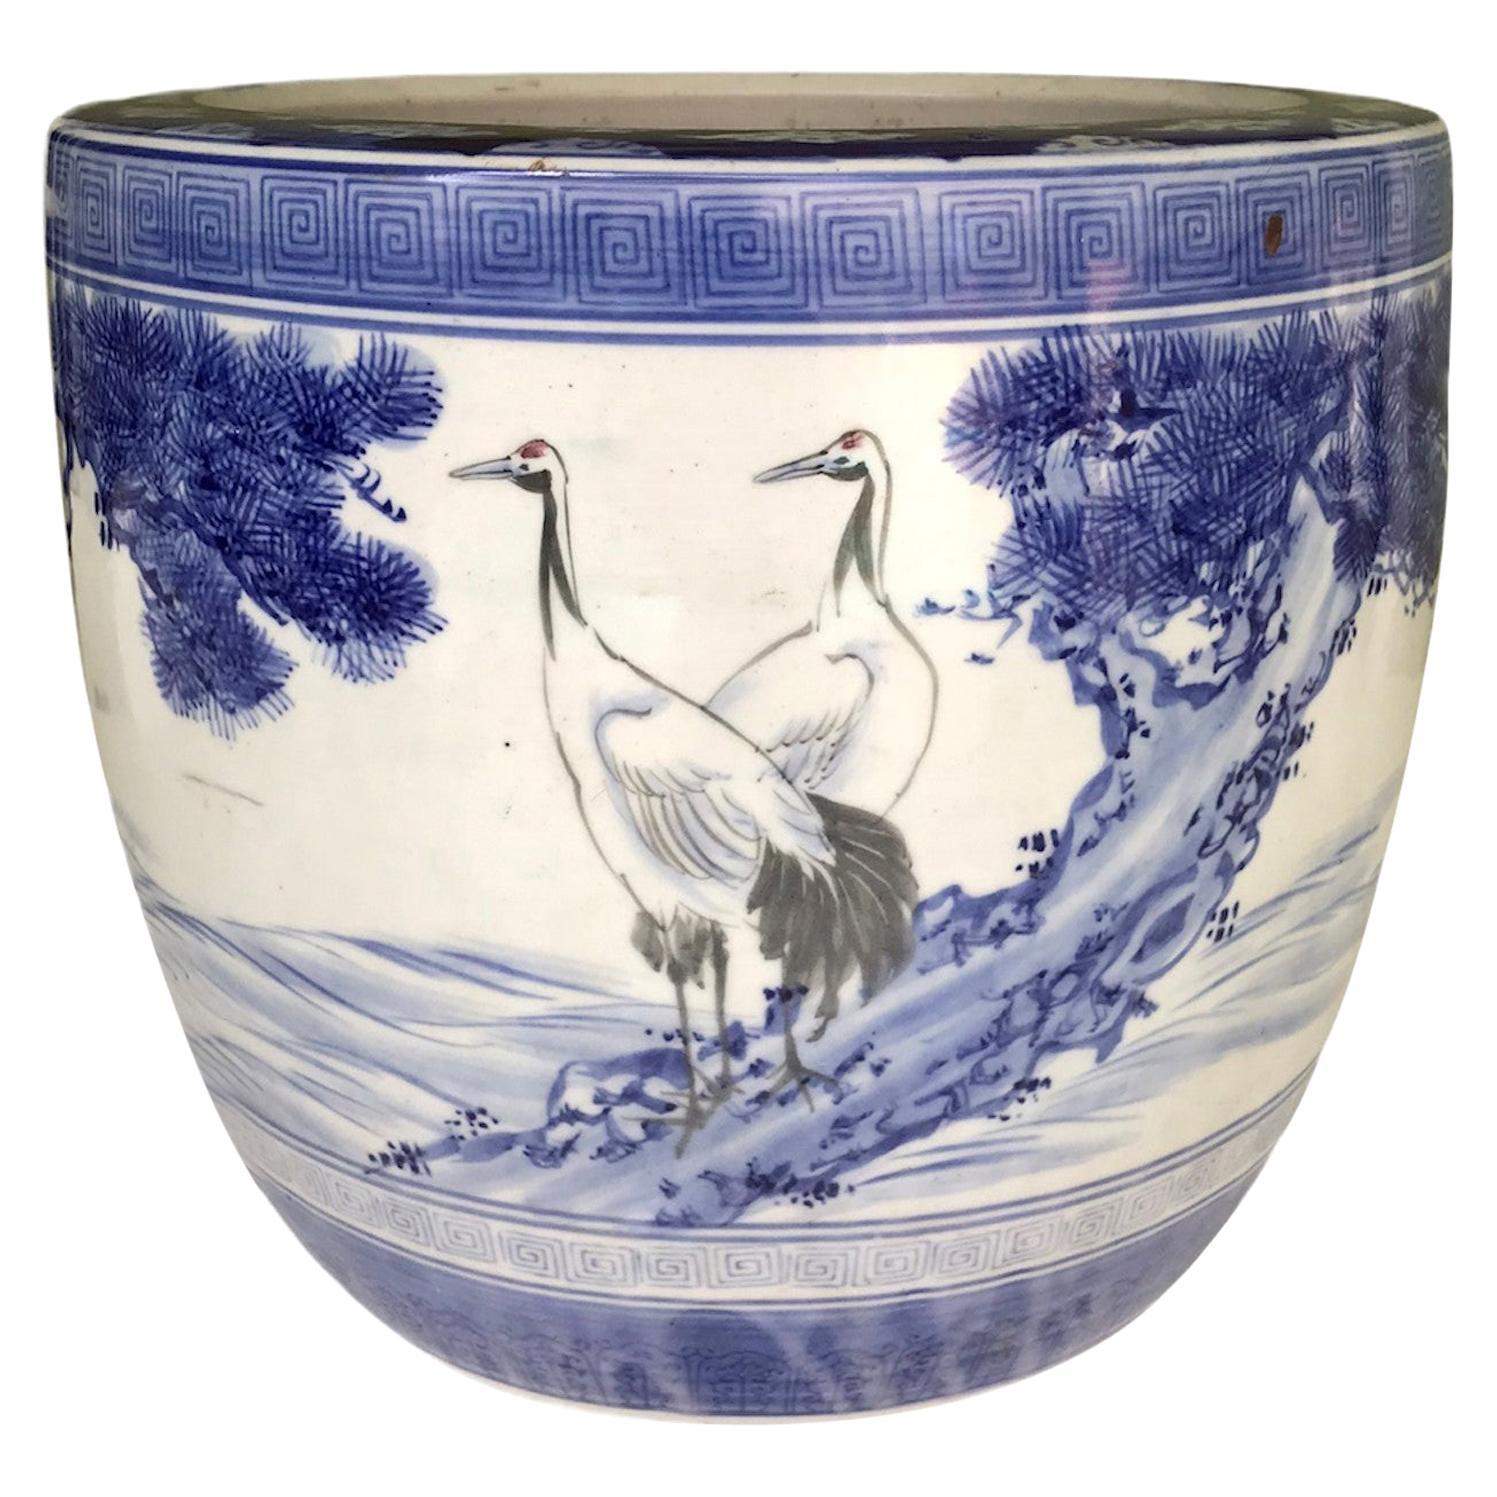 1950s Japanese Modern Blue/White Ceramic Hibachi w Cranes, Pine Trees, Mountains